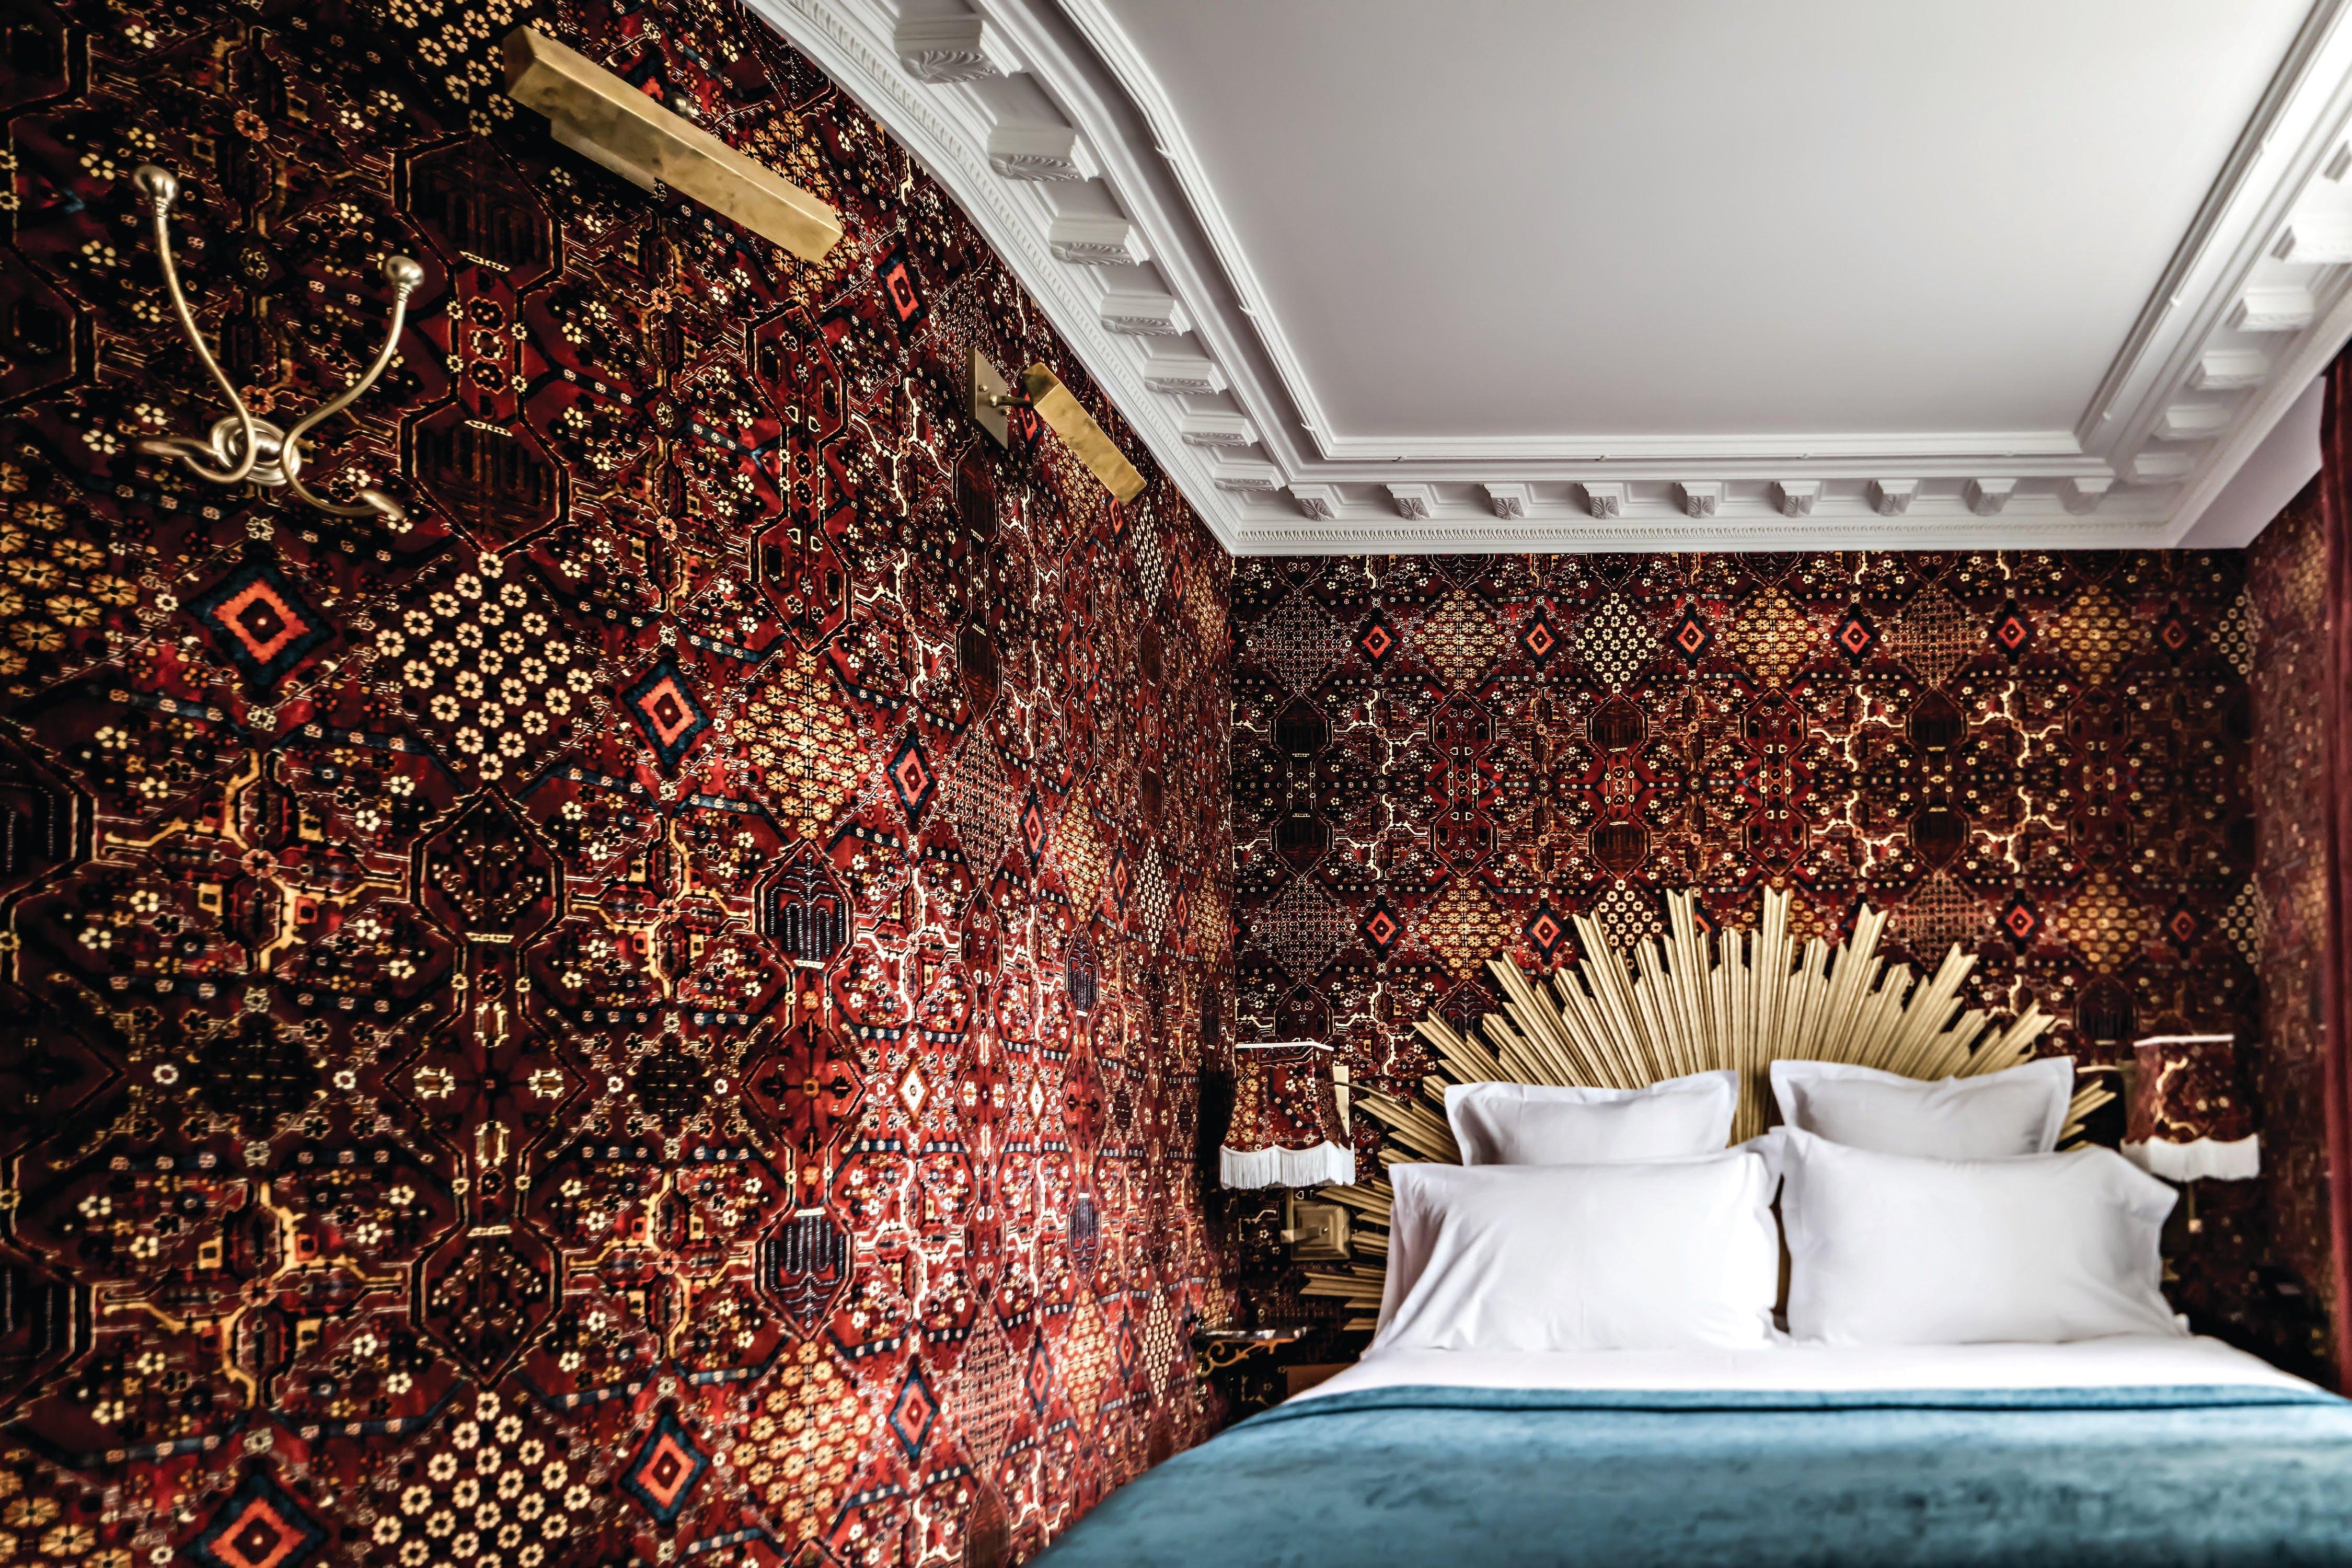 Rouge Dans Une Chambre hotel providence - benoit linero - chambre rouge (3) - space